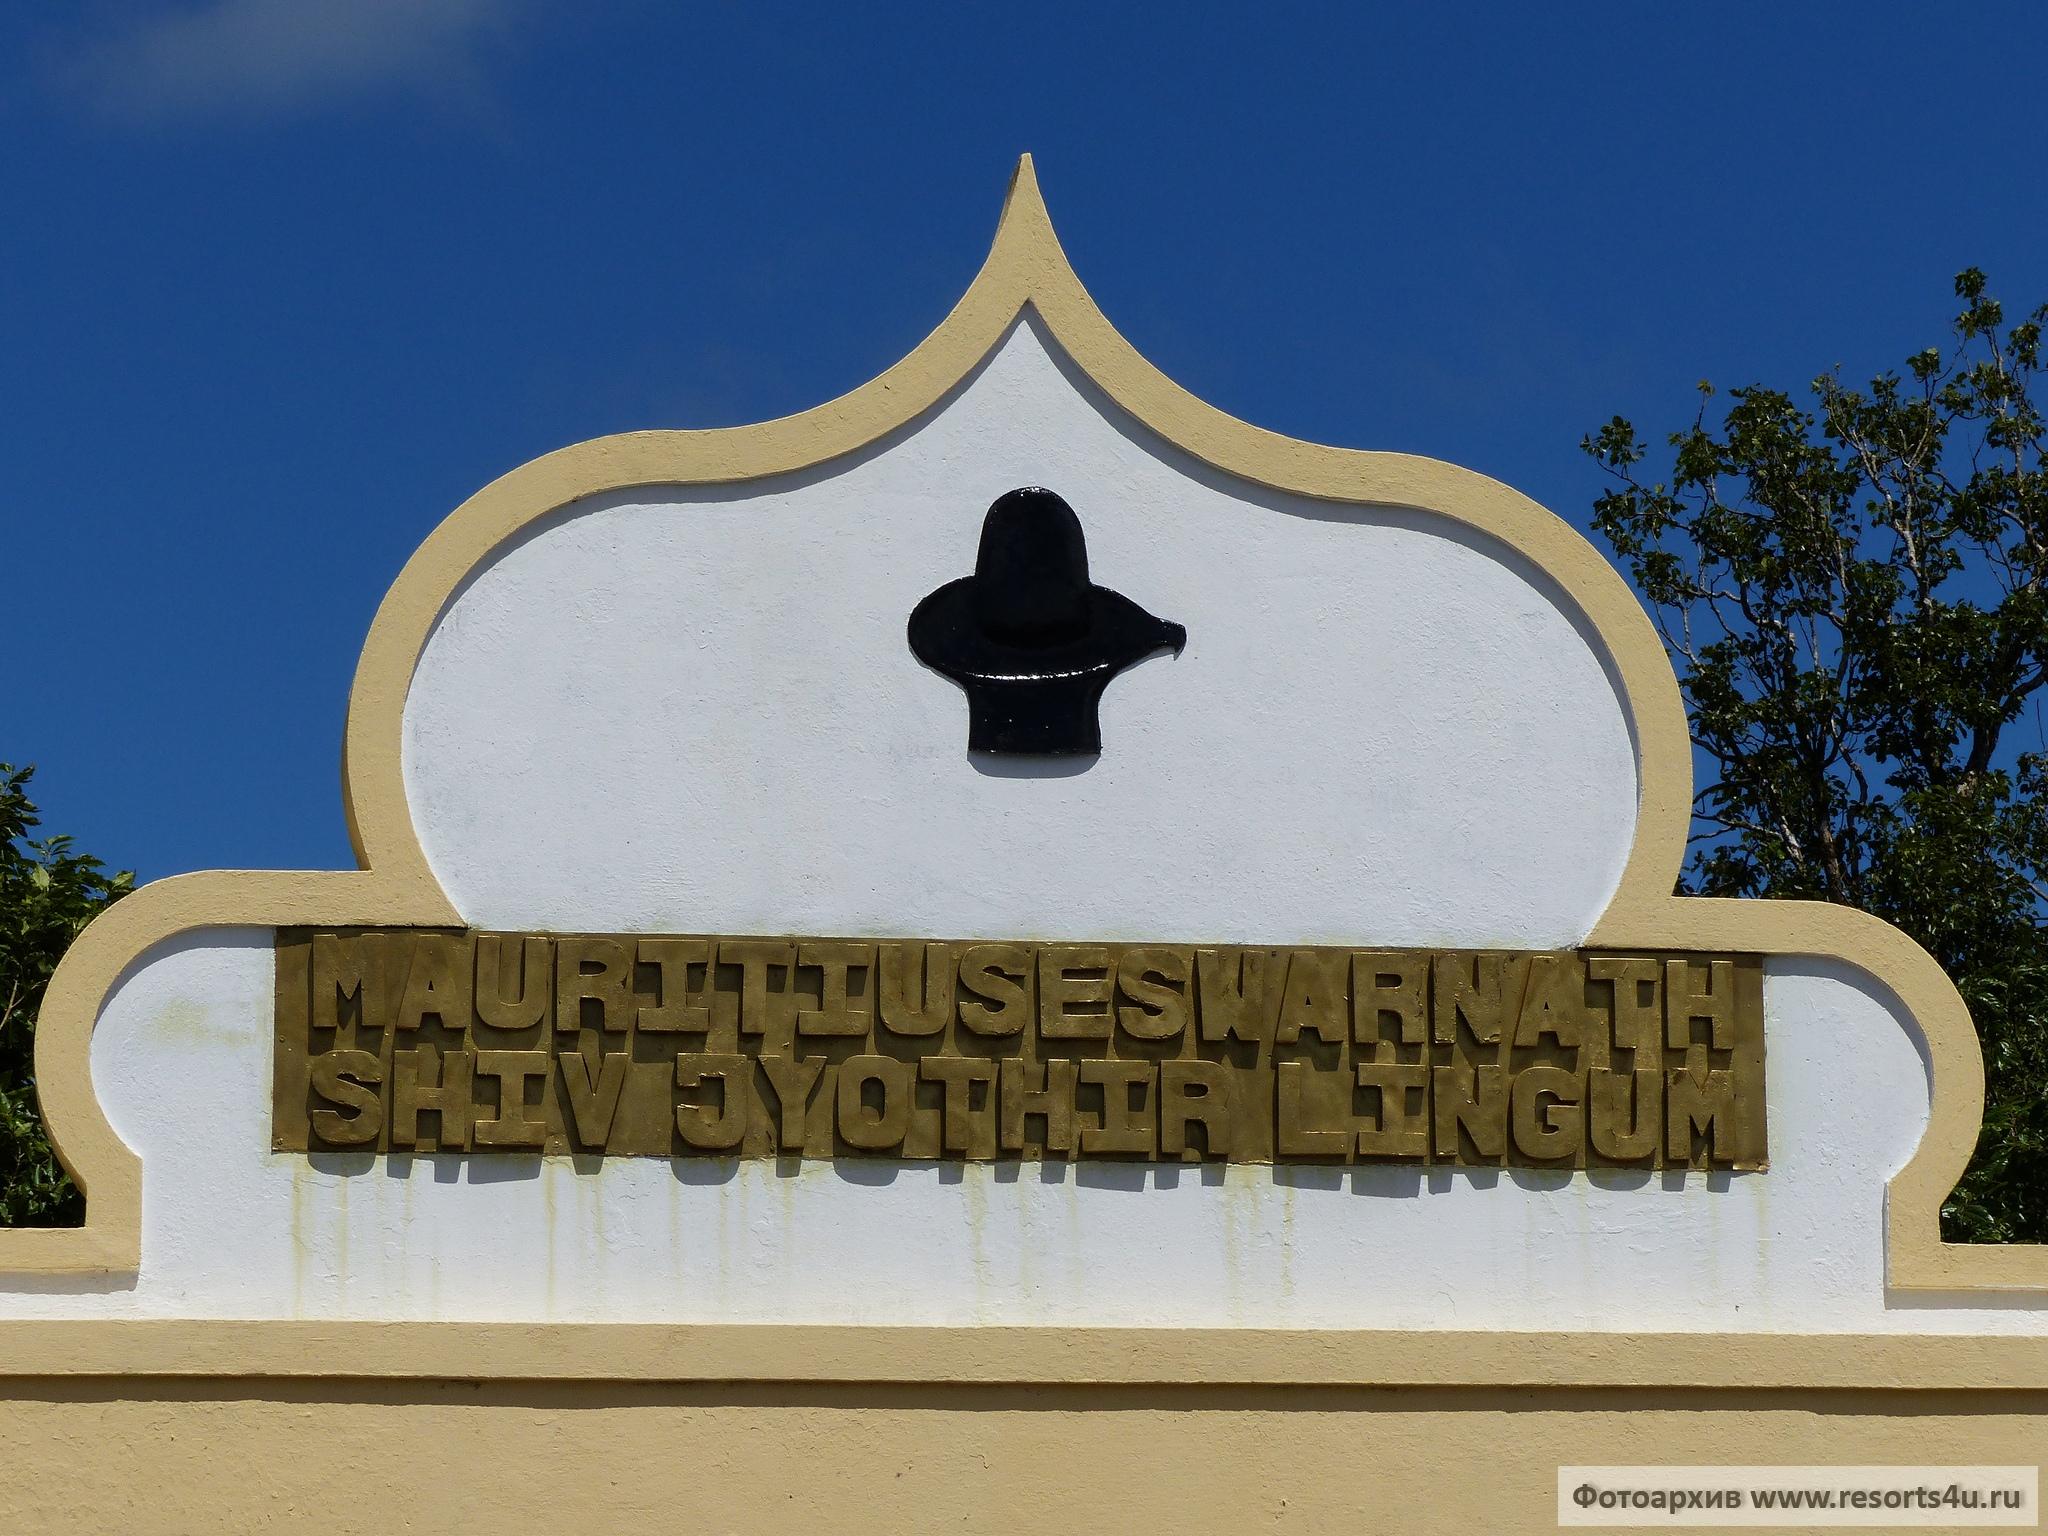 Маврикий: Ганга Талао (Гранд Бассин)